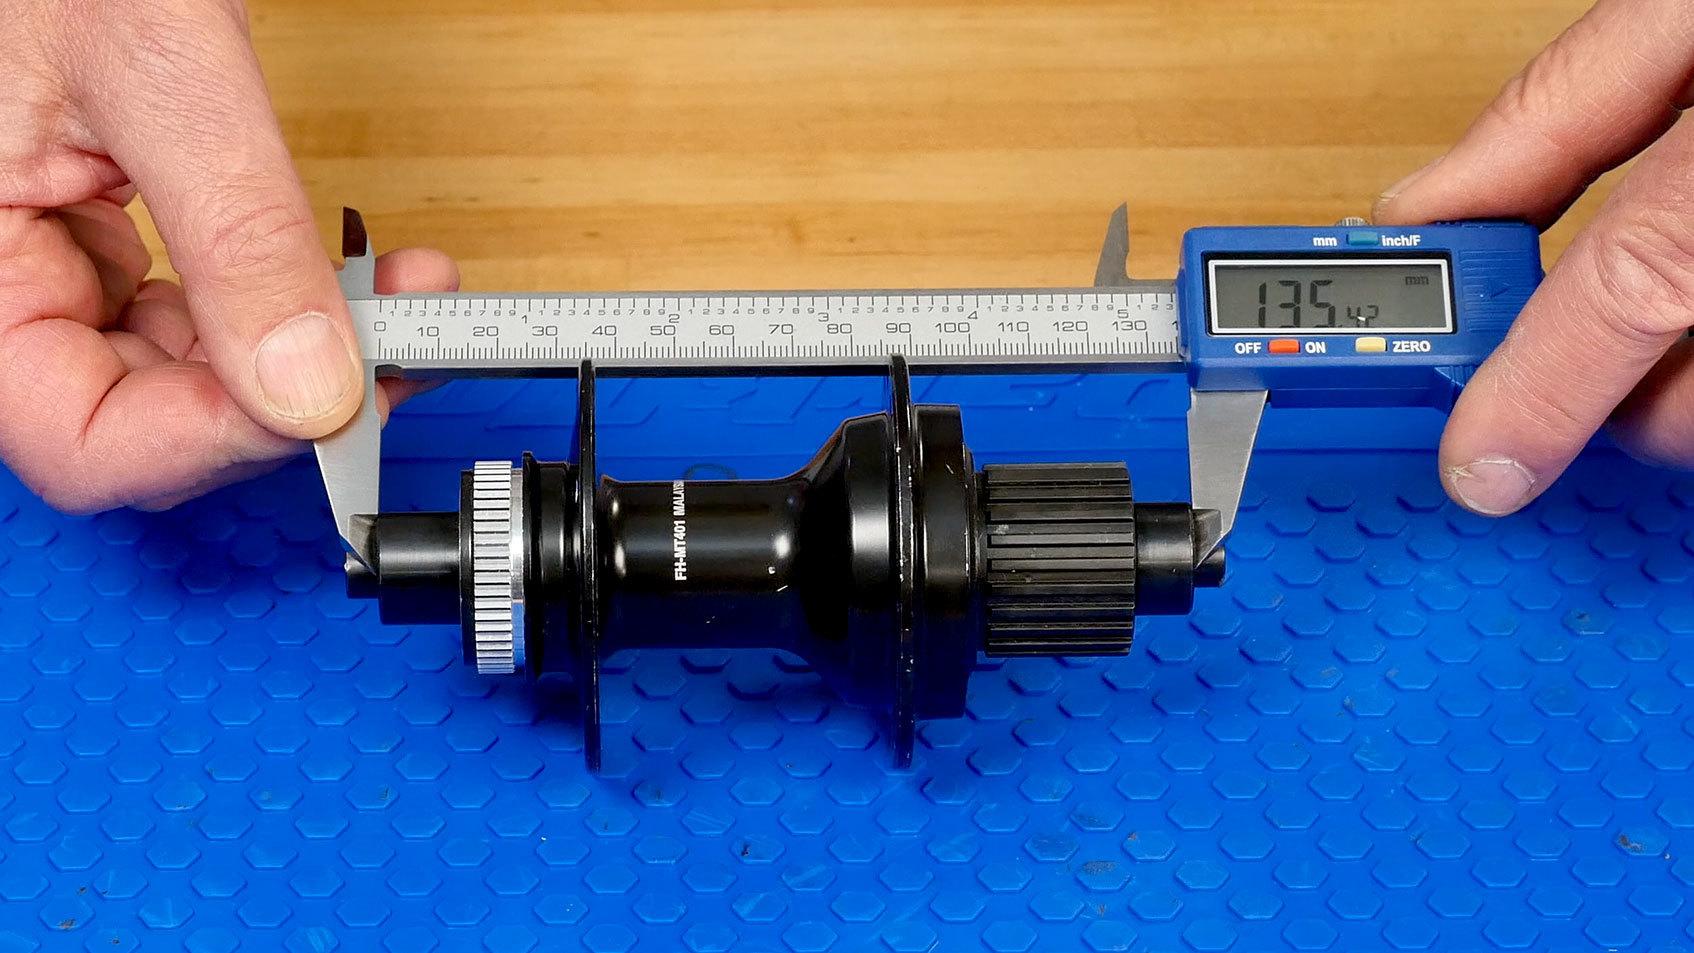 Measuring hub width with a digital caliper